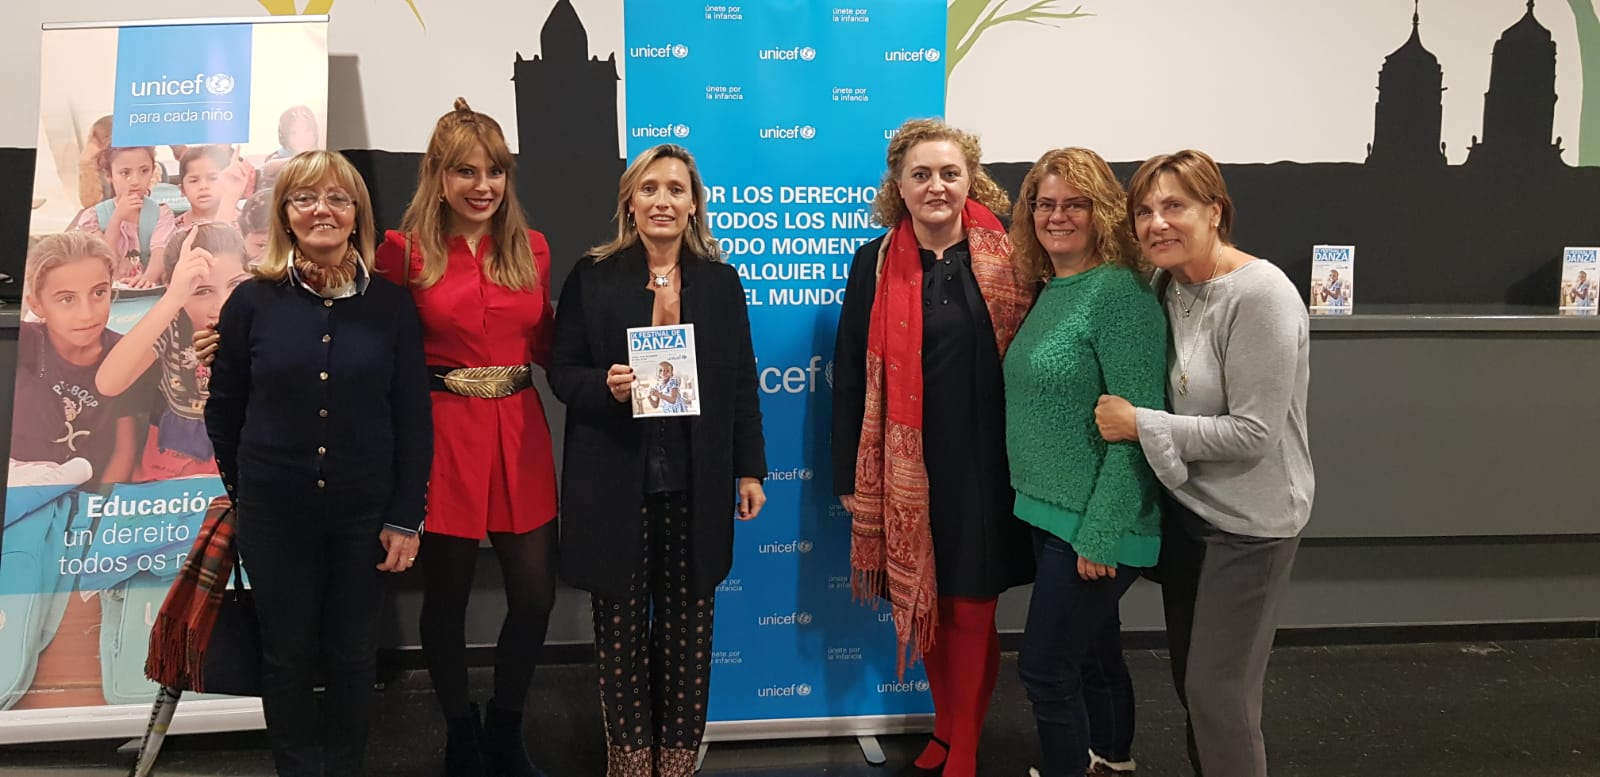 Sonsoles López Izquierdo participou no IX Festival de Danza a Favor de UNICEF que organiza o Conservatorio de Lugo